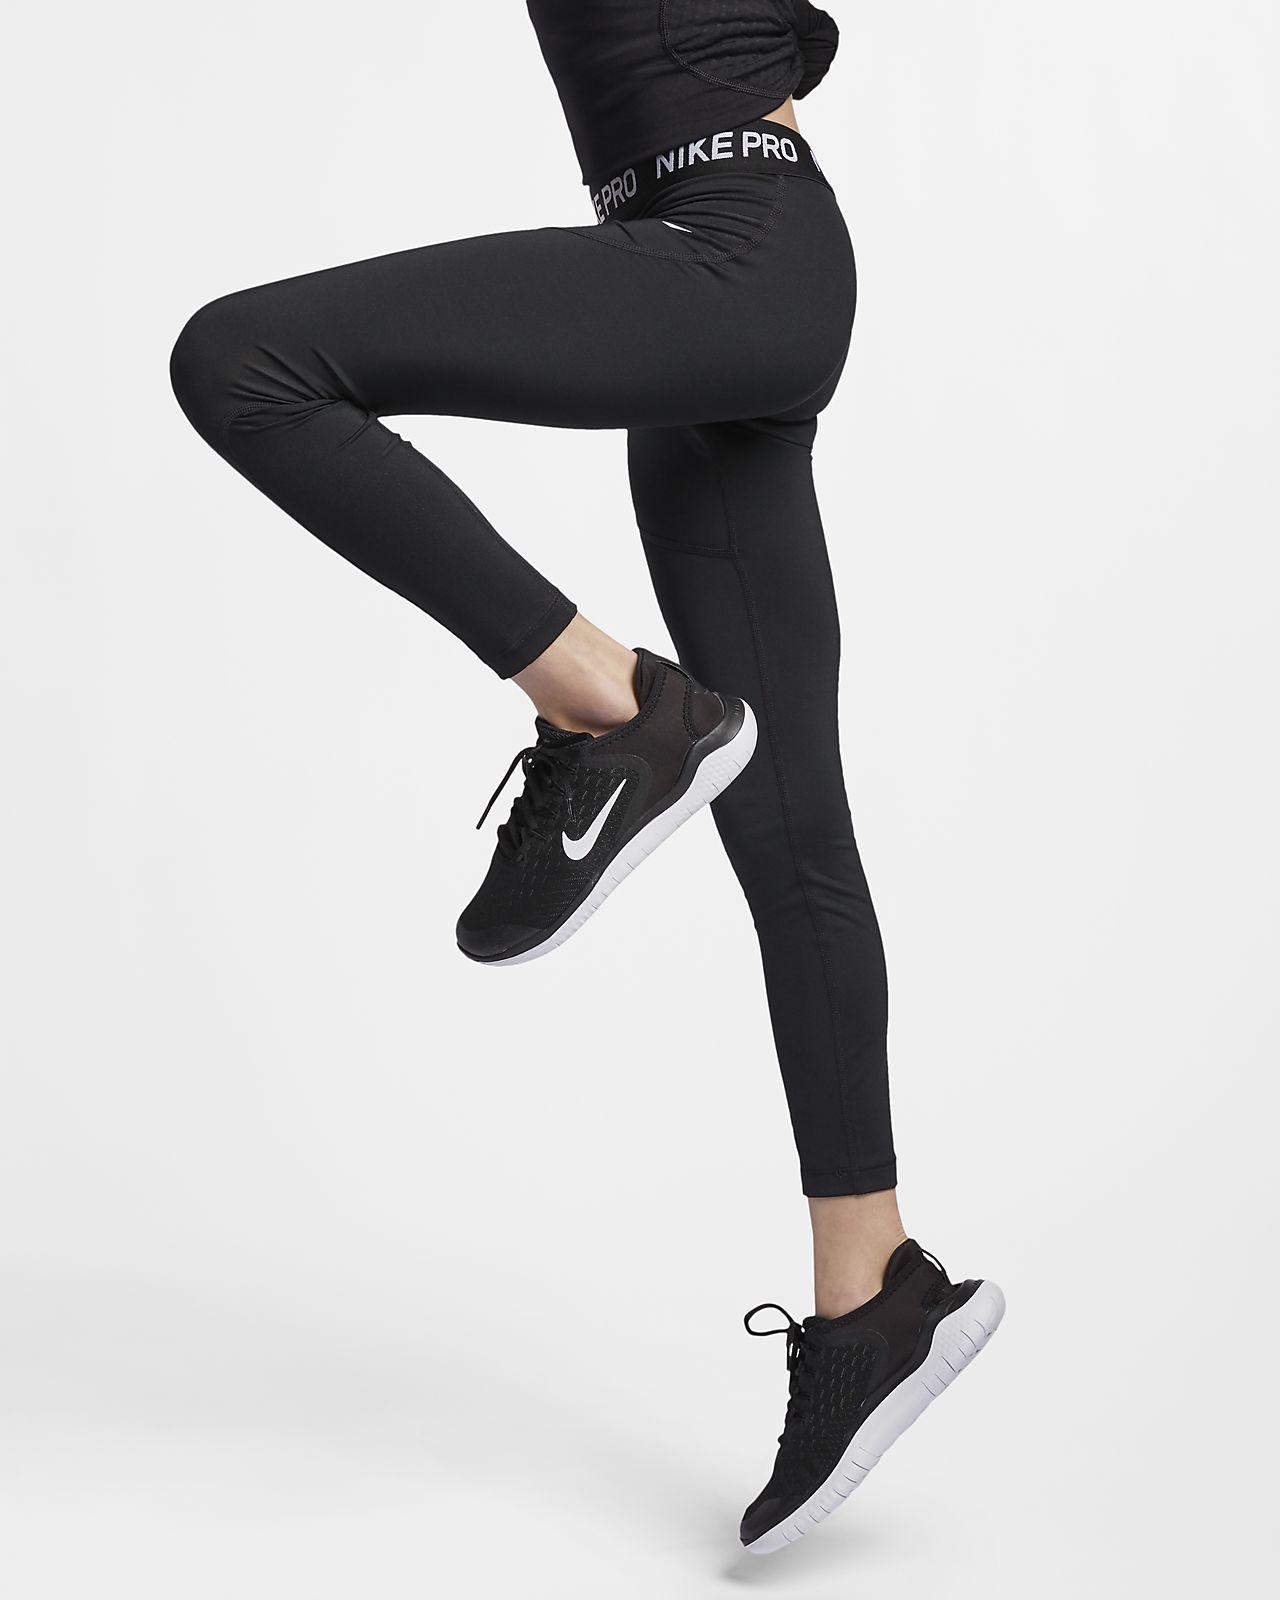 Nike Pro Malles - Nena